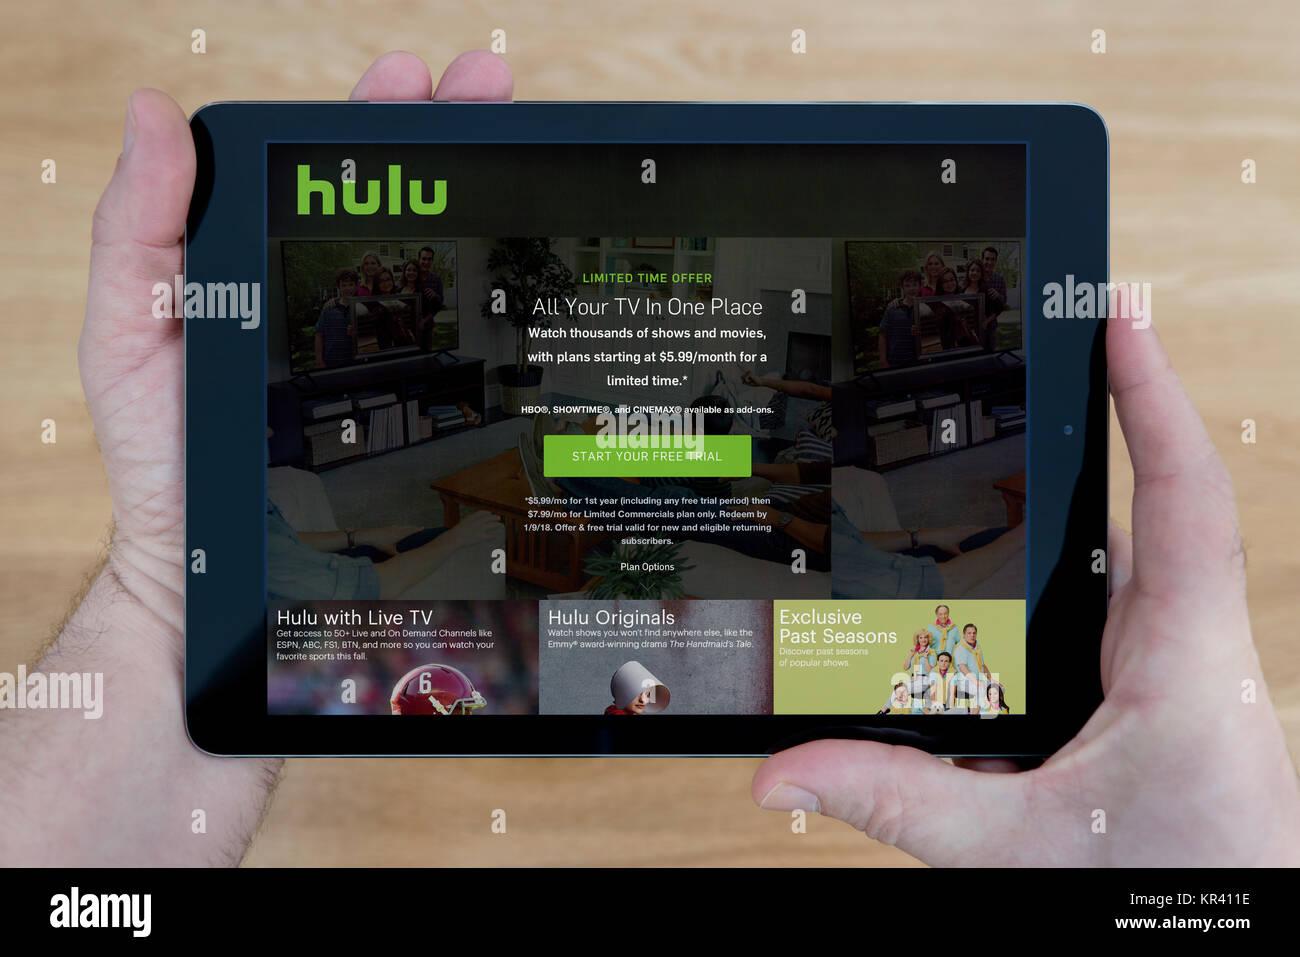 Hulu App Stock Photos & Hulu App Stock Images - Alamy